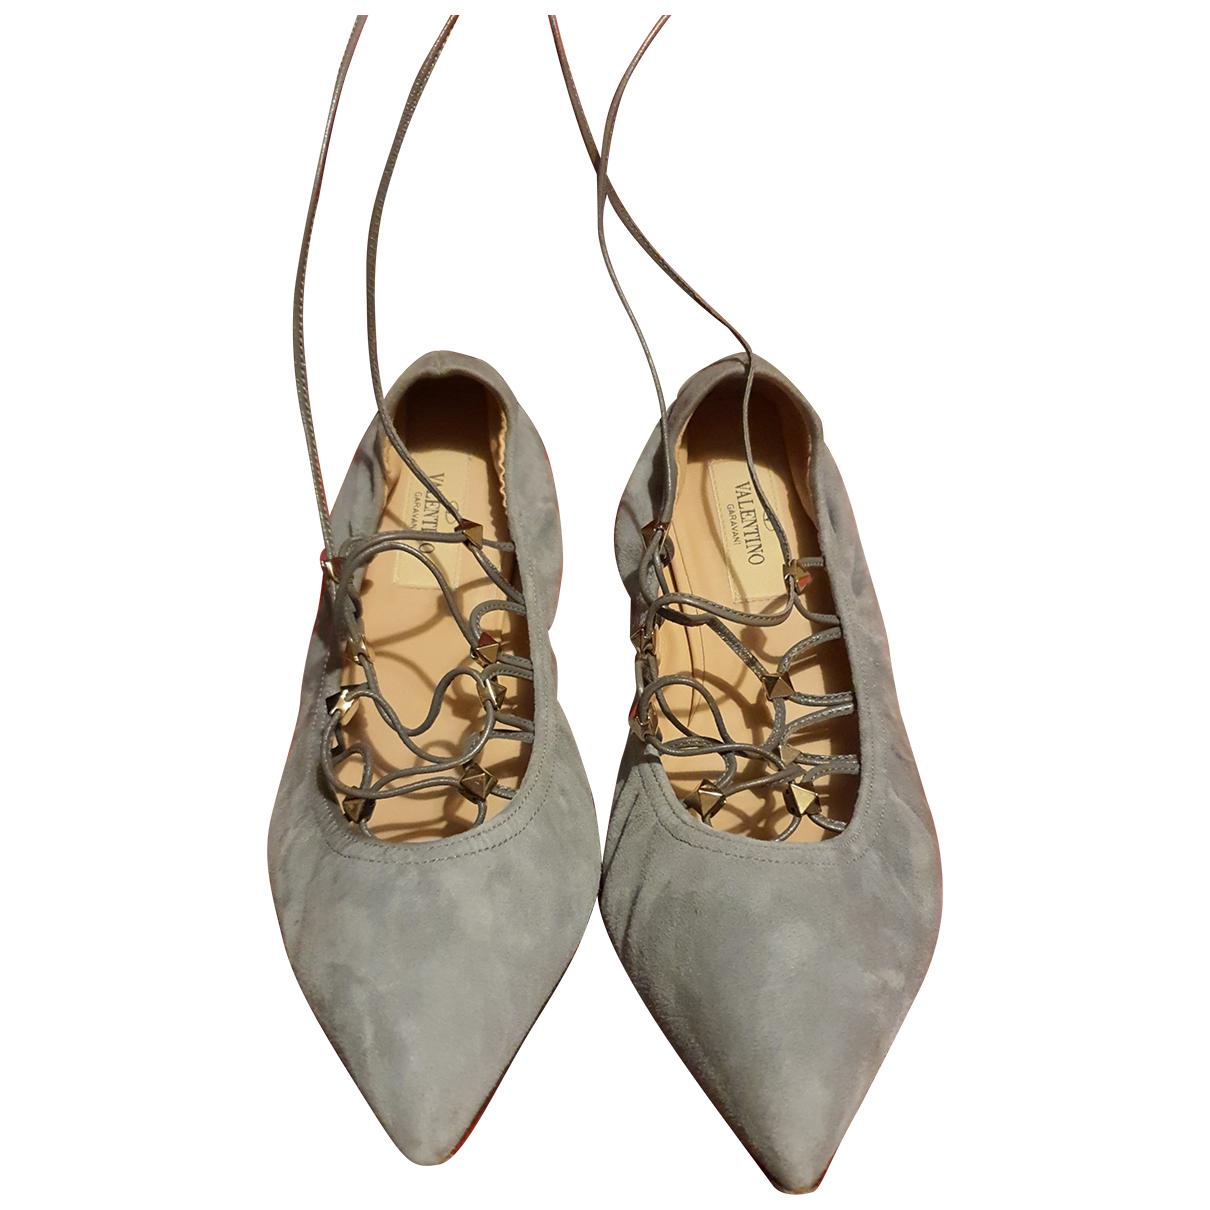 Valentino Garavani Rockstud Grey Suede Ballet flats for Women 36 EU